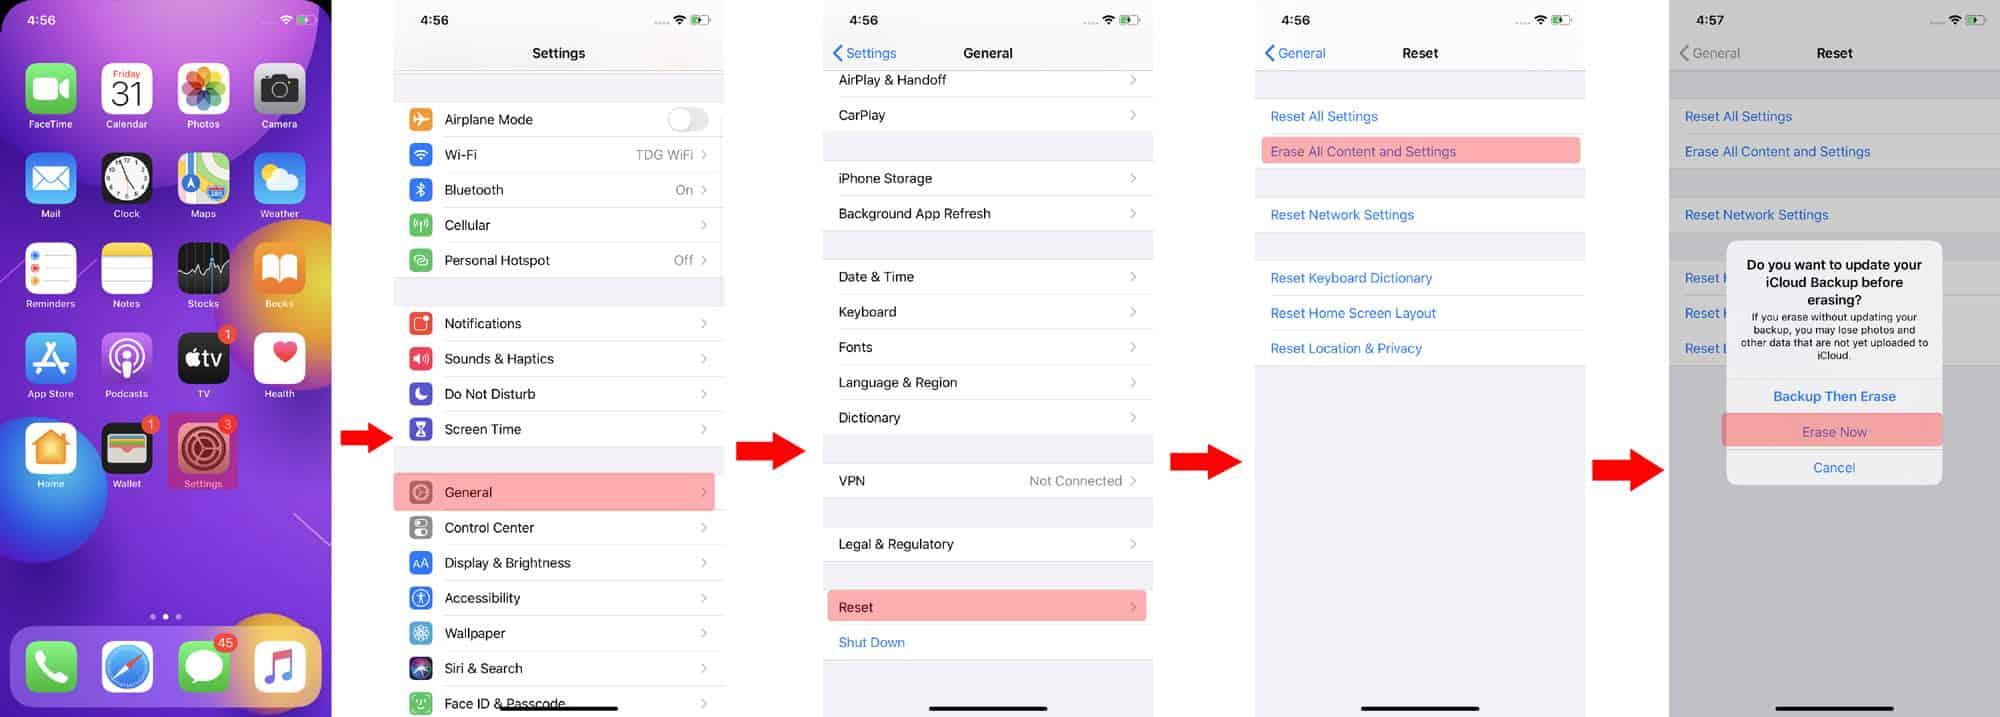 factory reset iphone ios 13 - fix personal hotspot not working